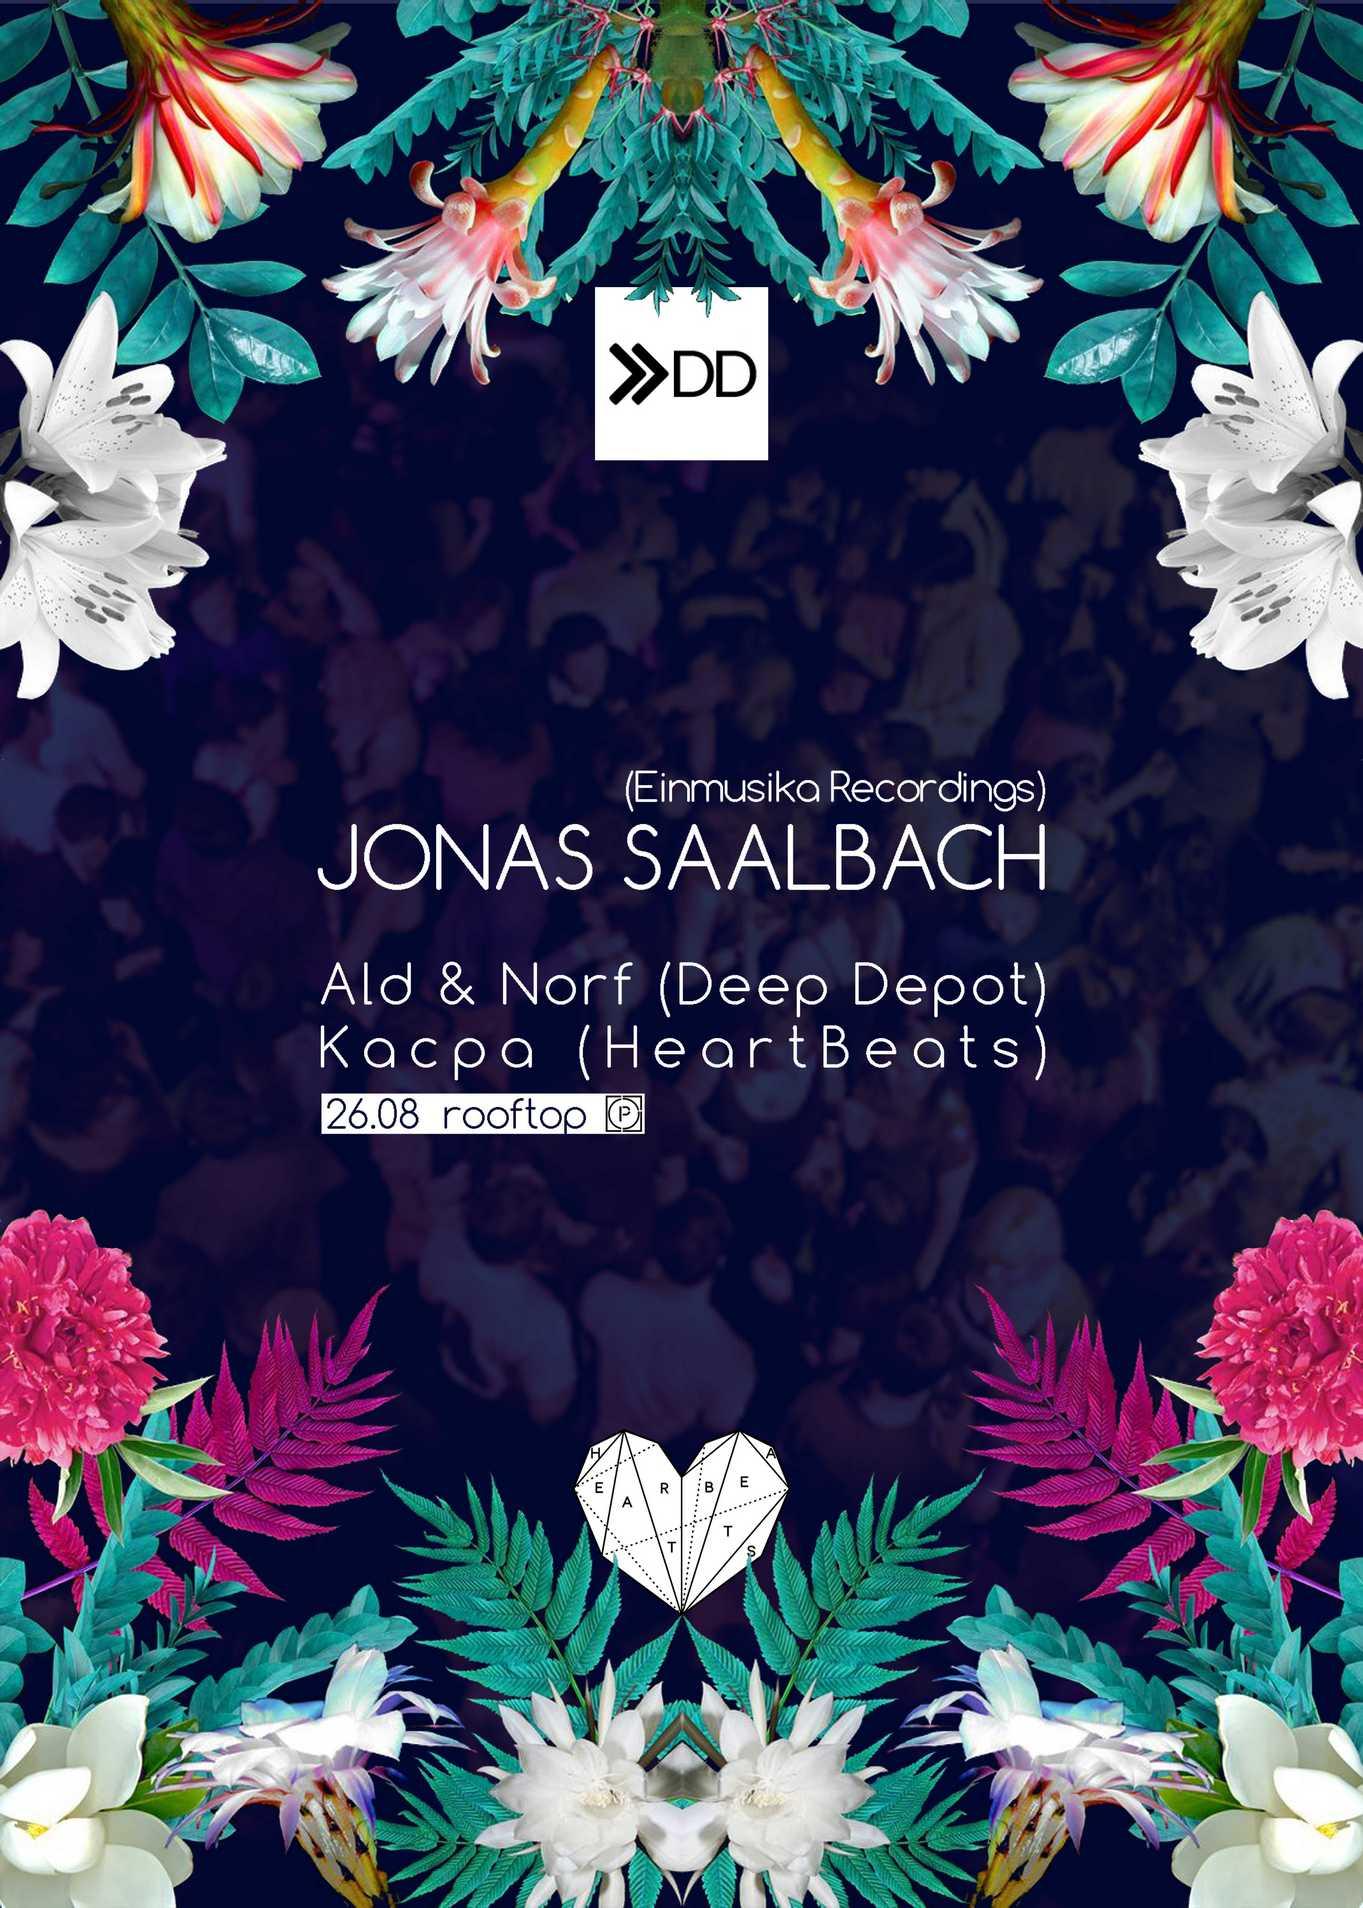 Jonas Saalbach – plakat (źródło: materiały prasowe organizatora)